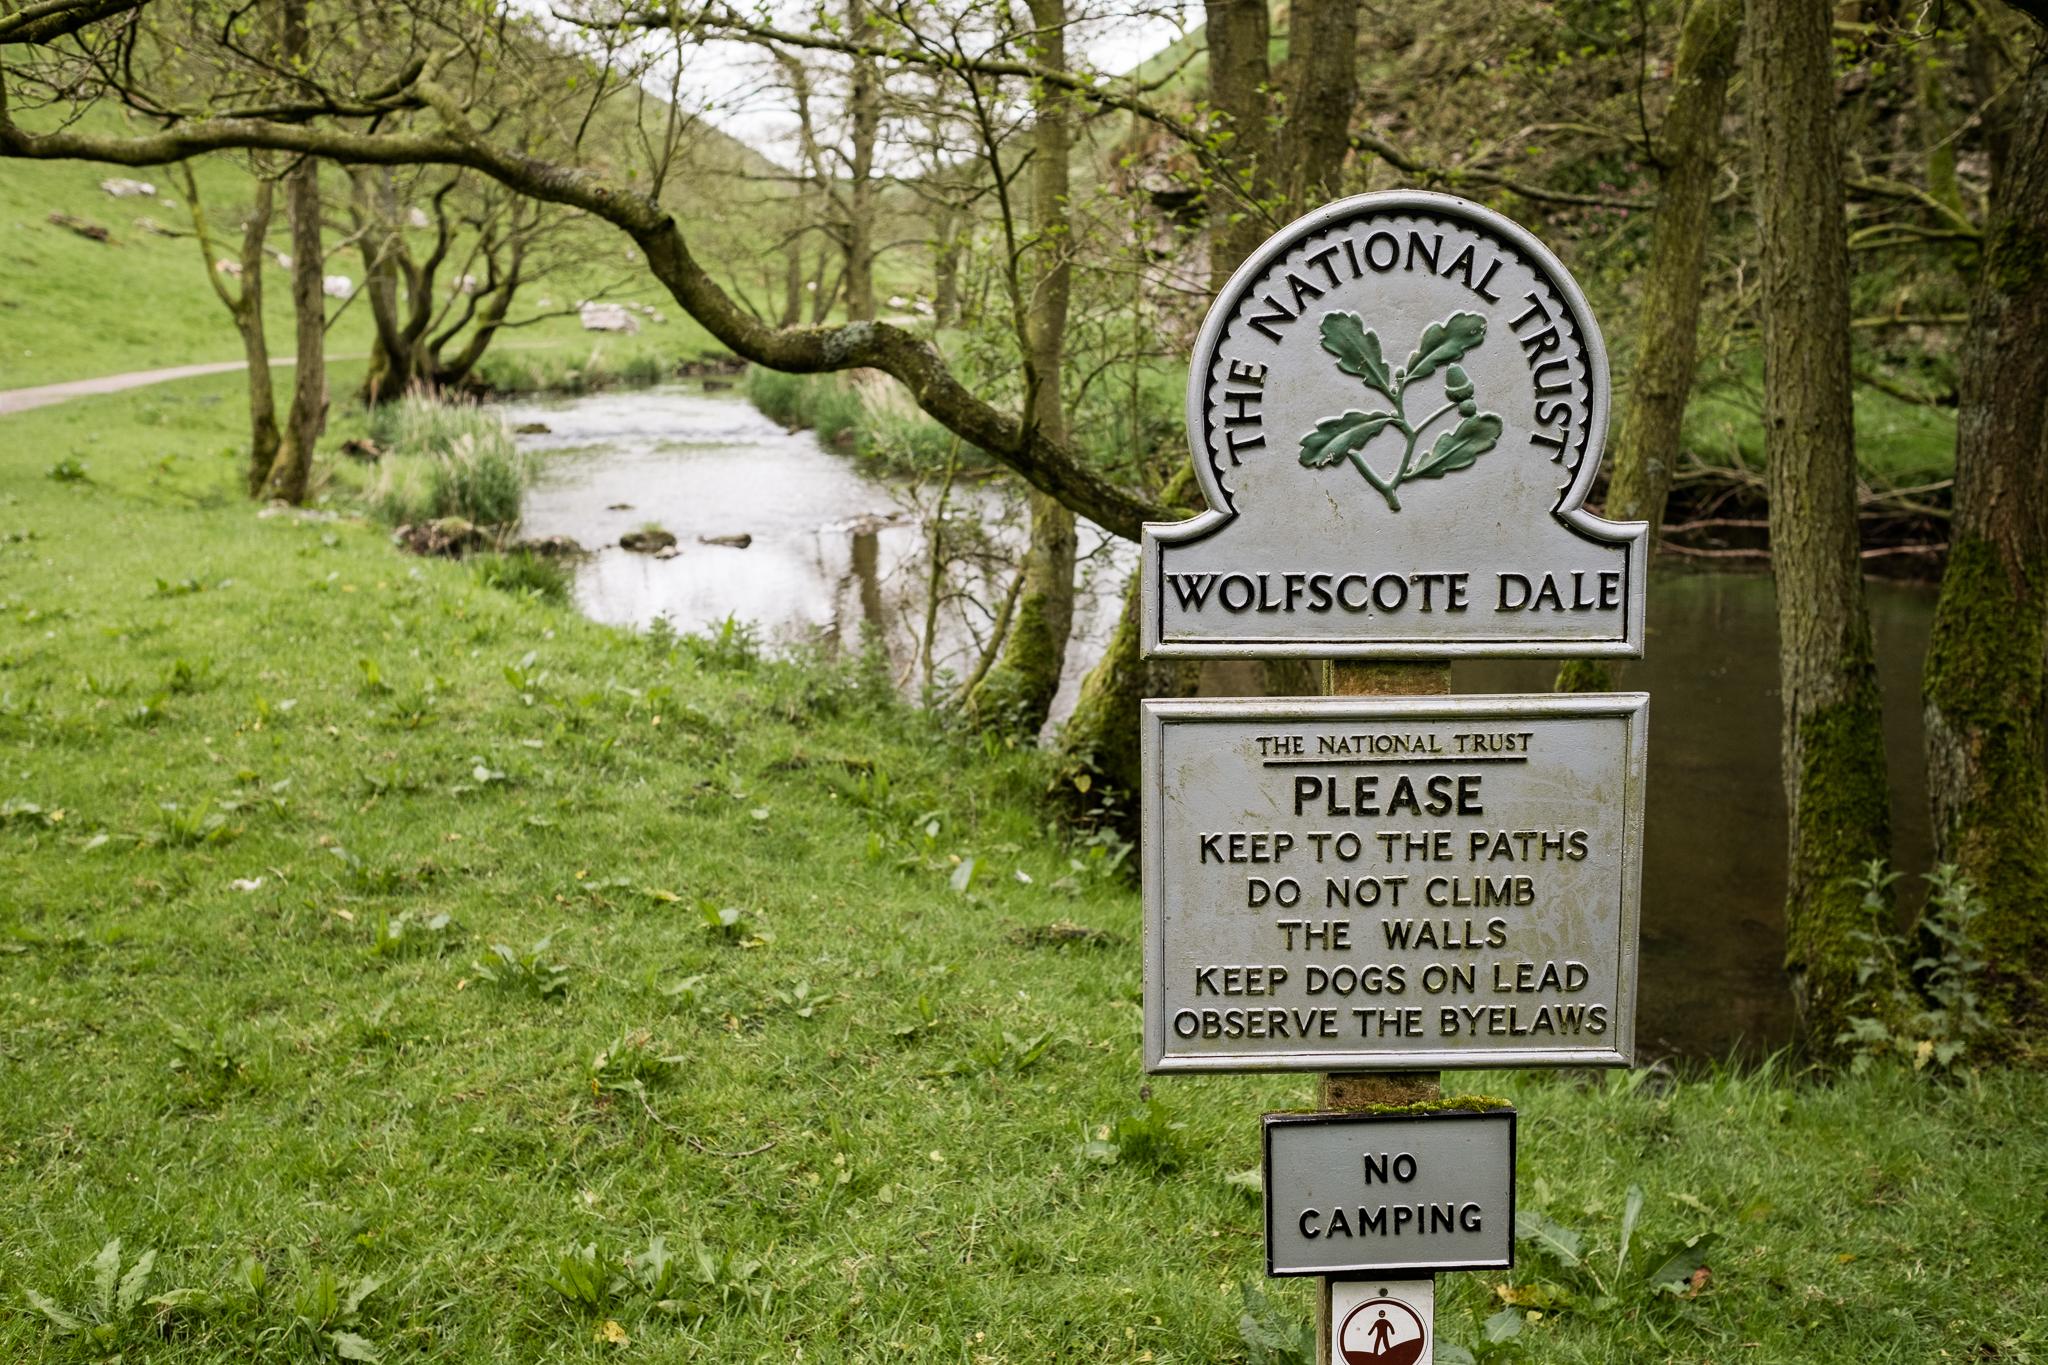 05.19.2017 The Photowalk Network Get Some Fresh Air Photowalk at Hartington and Biggin, Staffordshire Peak District National Trust-15.jpg